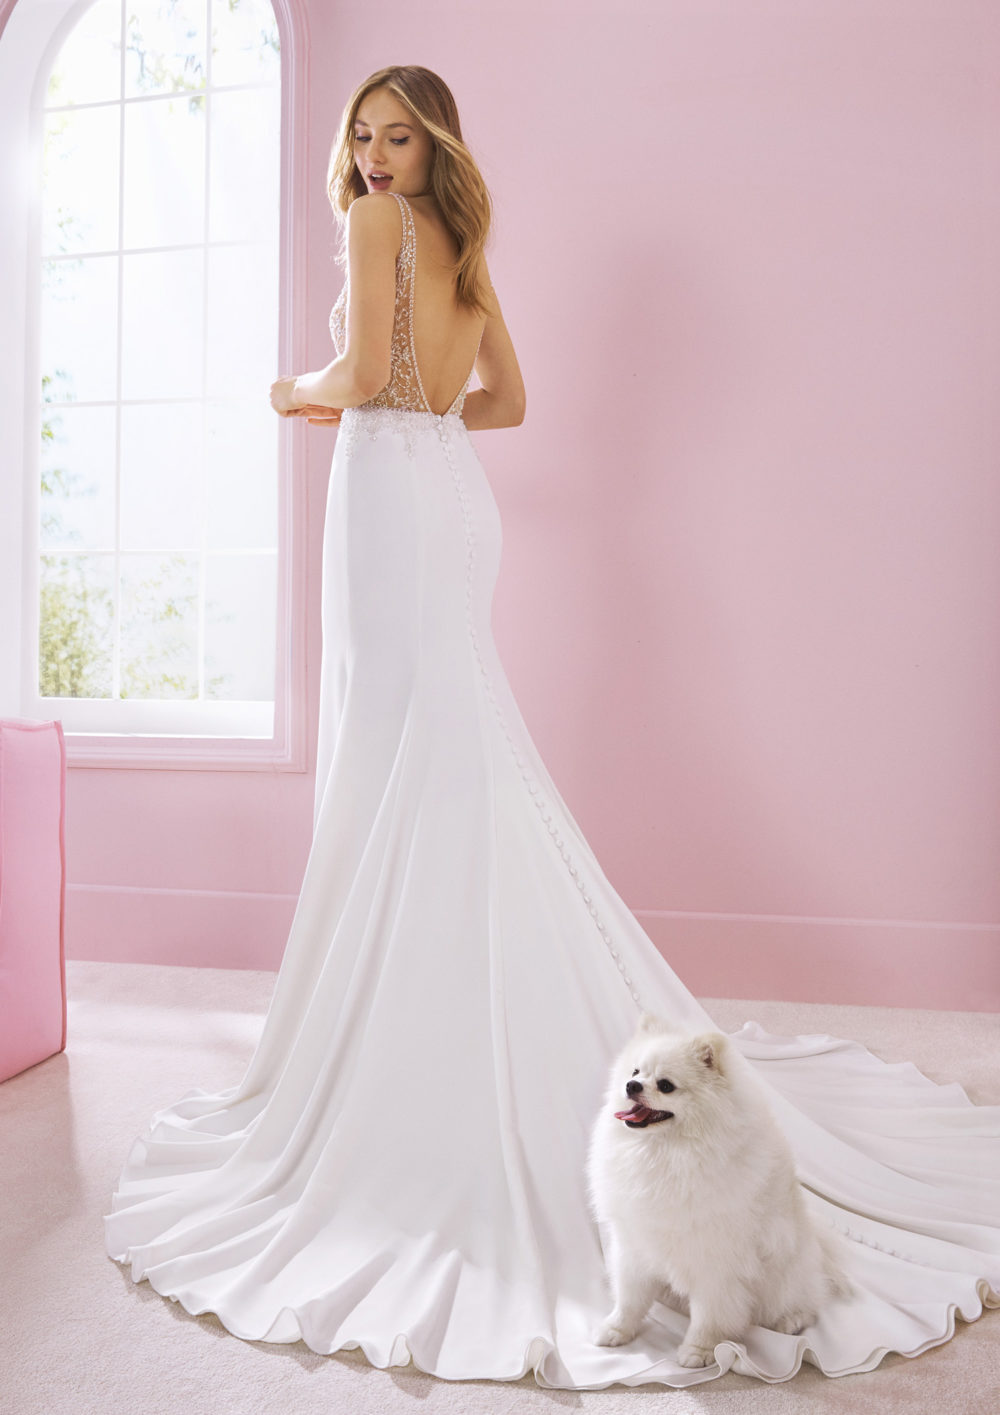 MMariages: abito da sposa Poème 2020 a Vicenza, Verona, Padova, Veneto KYLIE